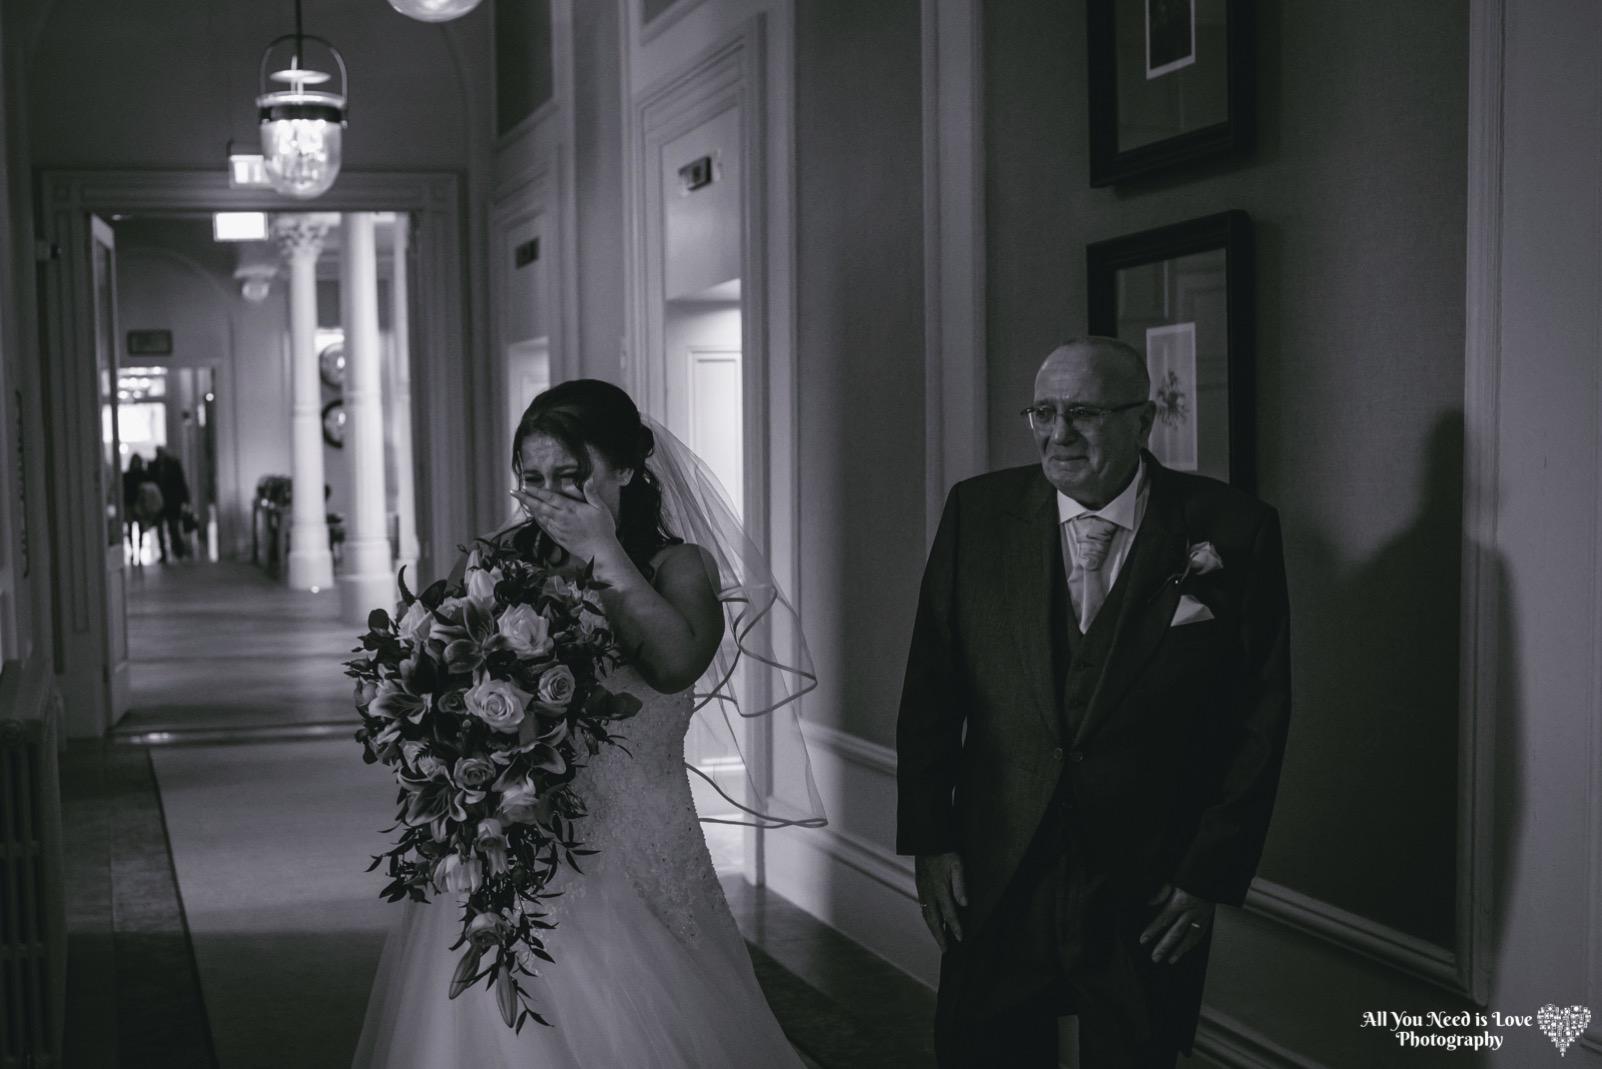 Wedding Photography in York